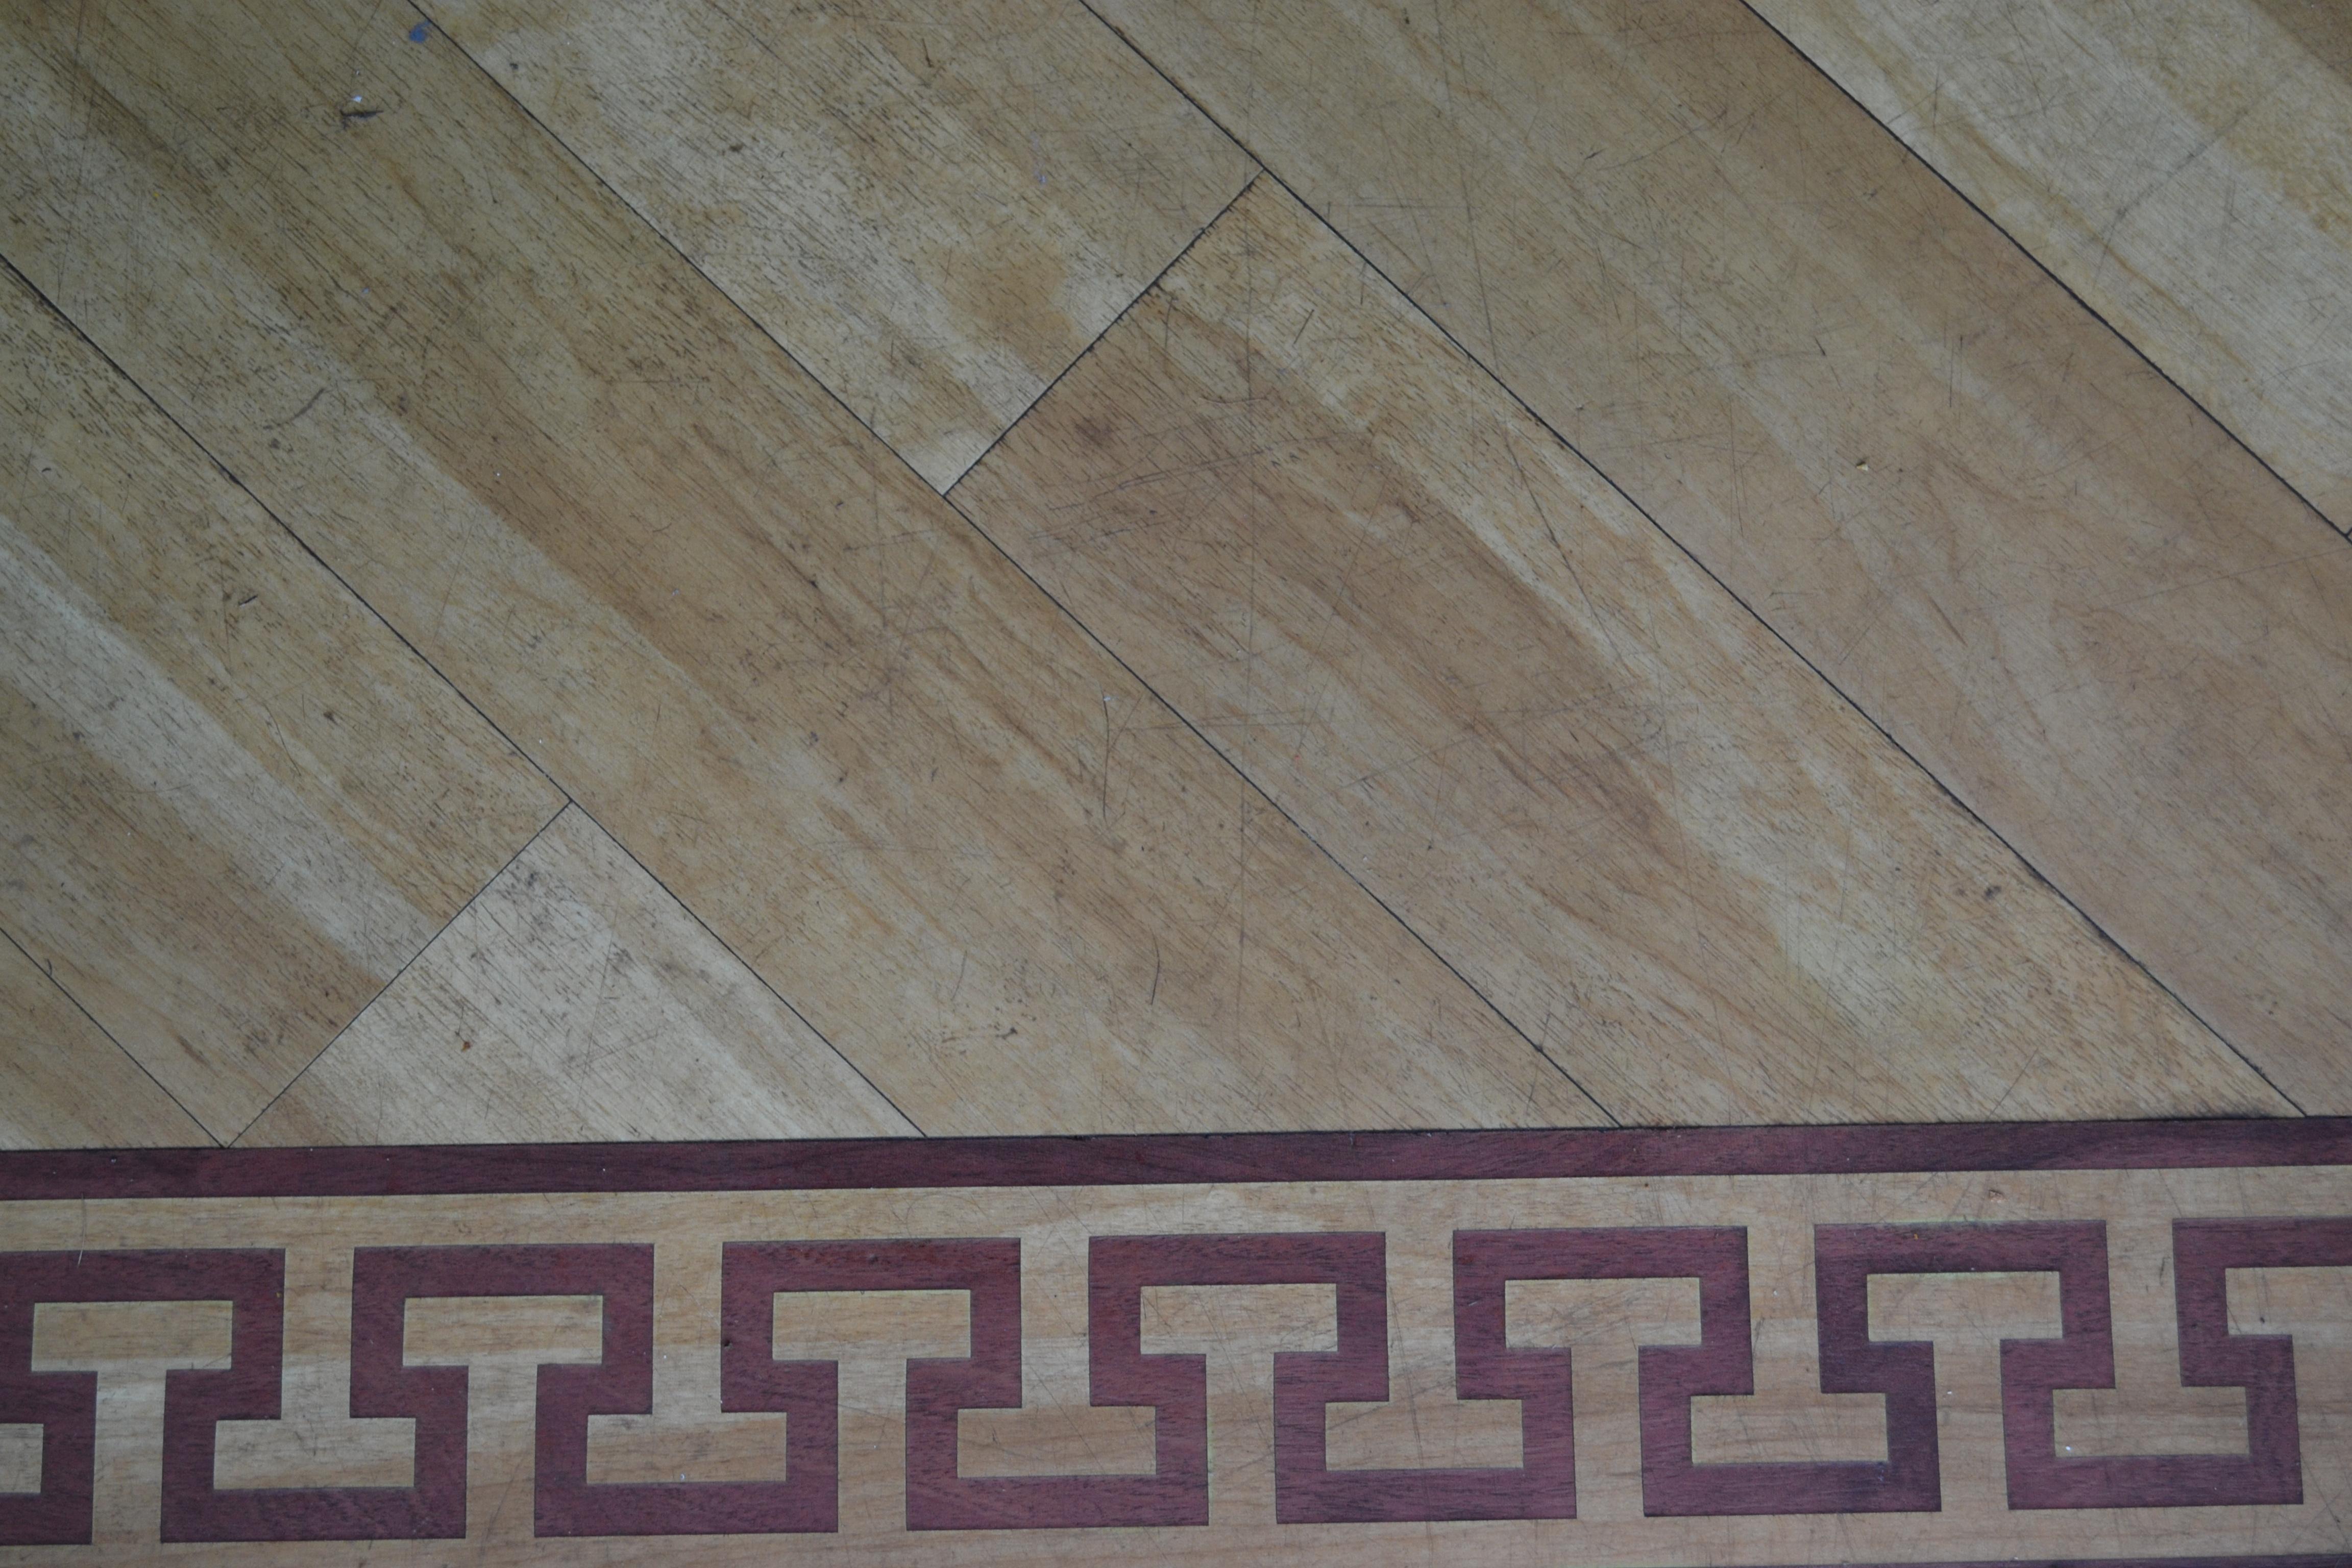 Scuffed Karndean floor